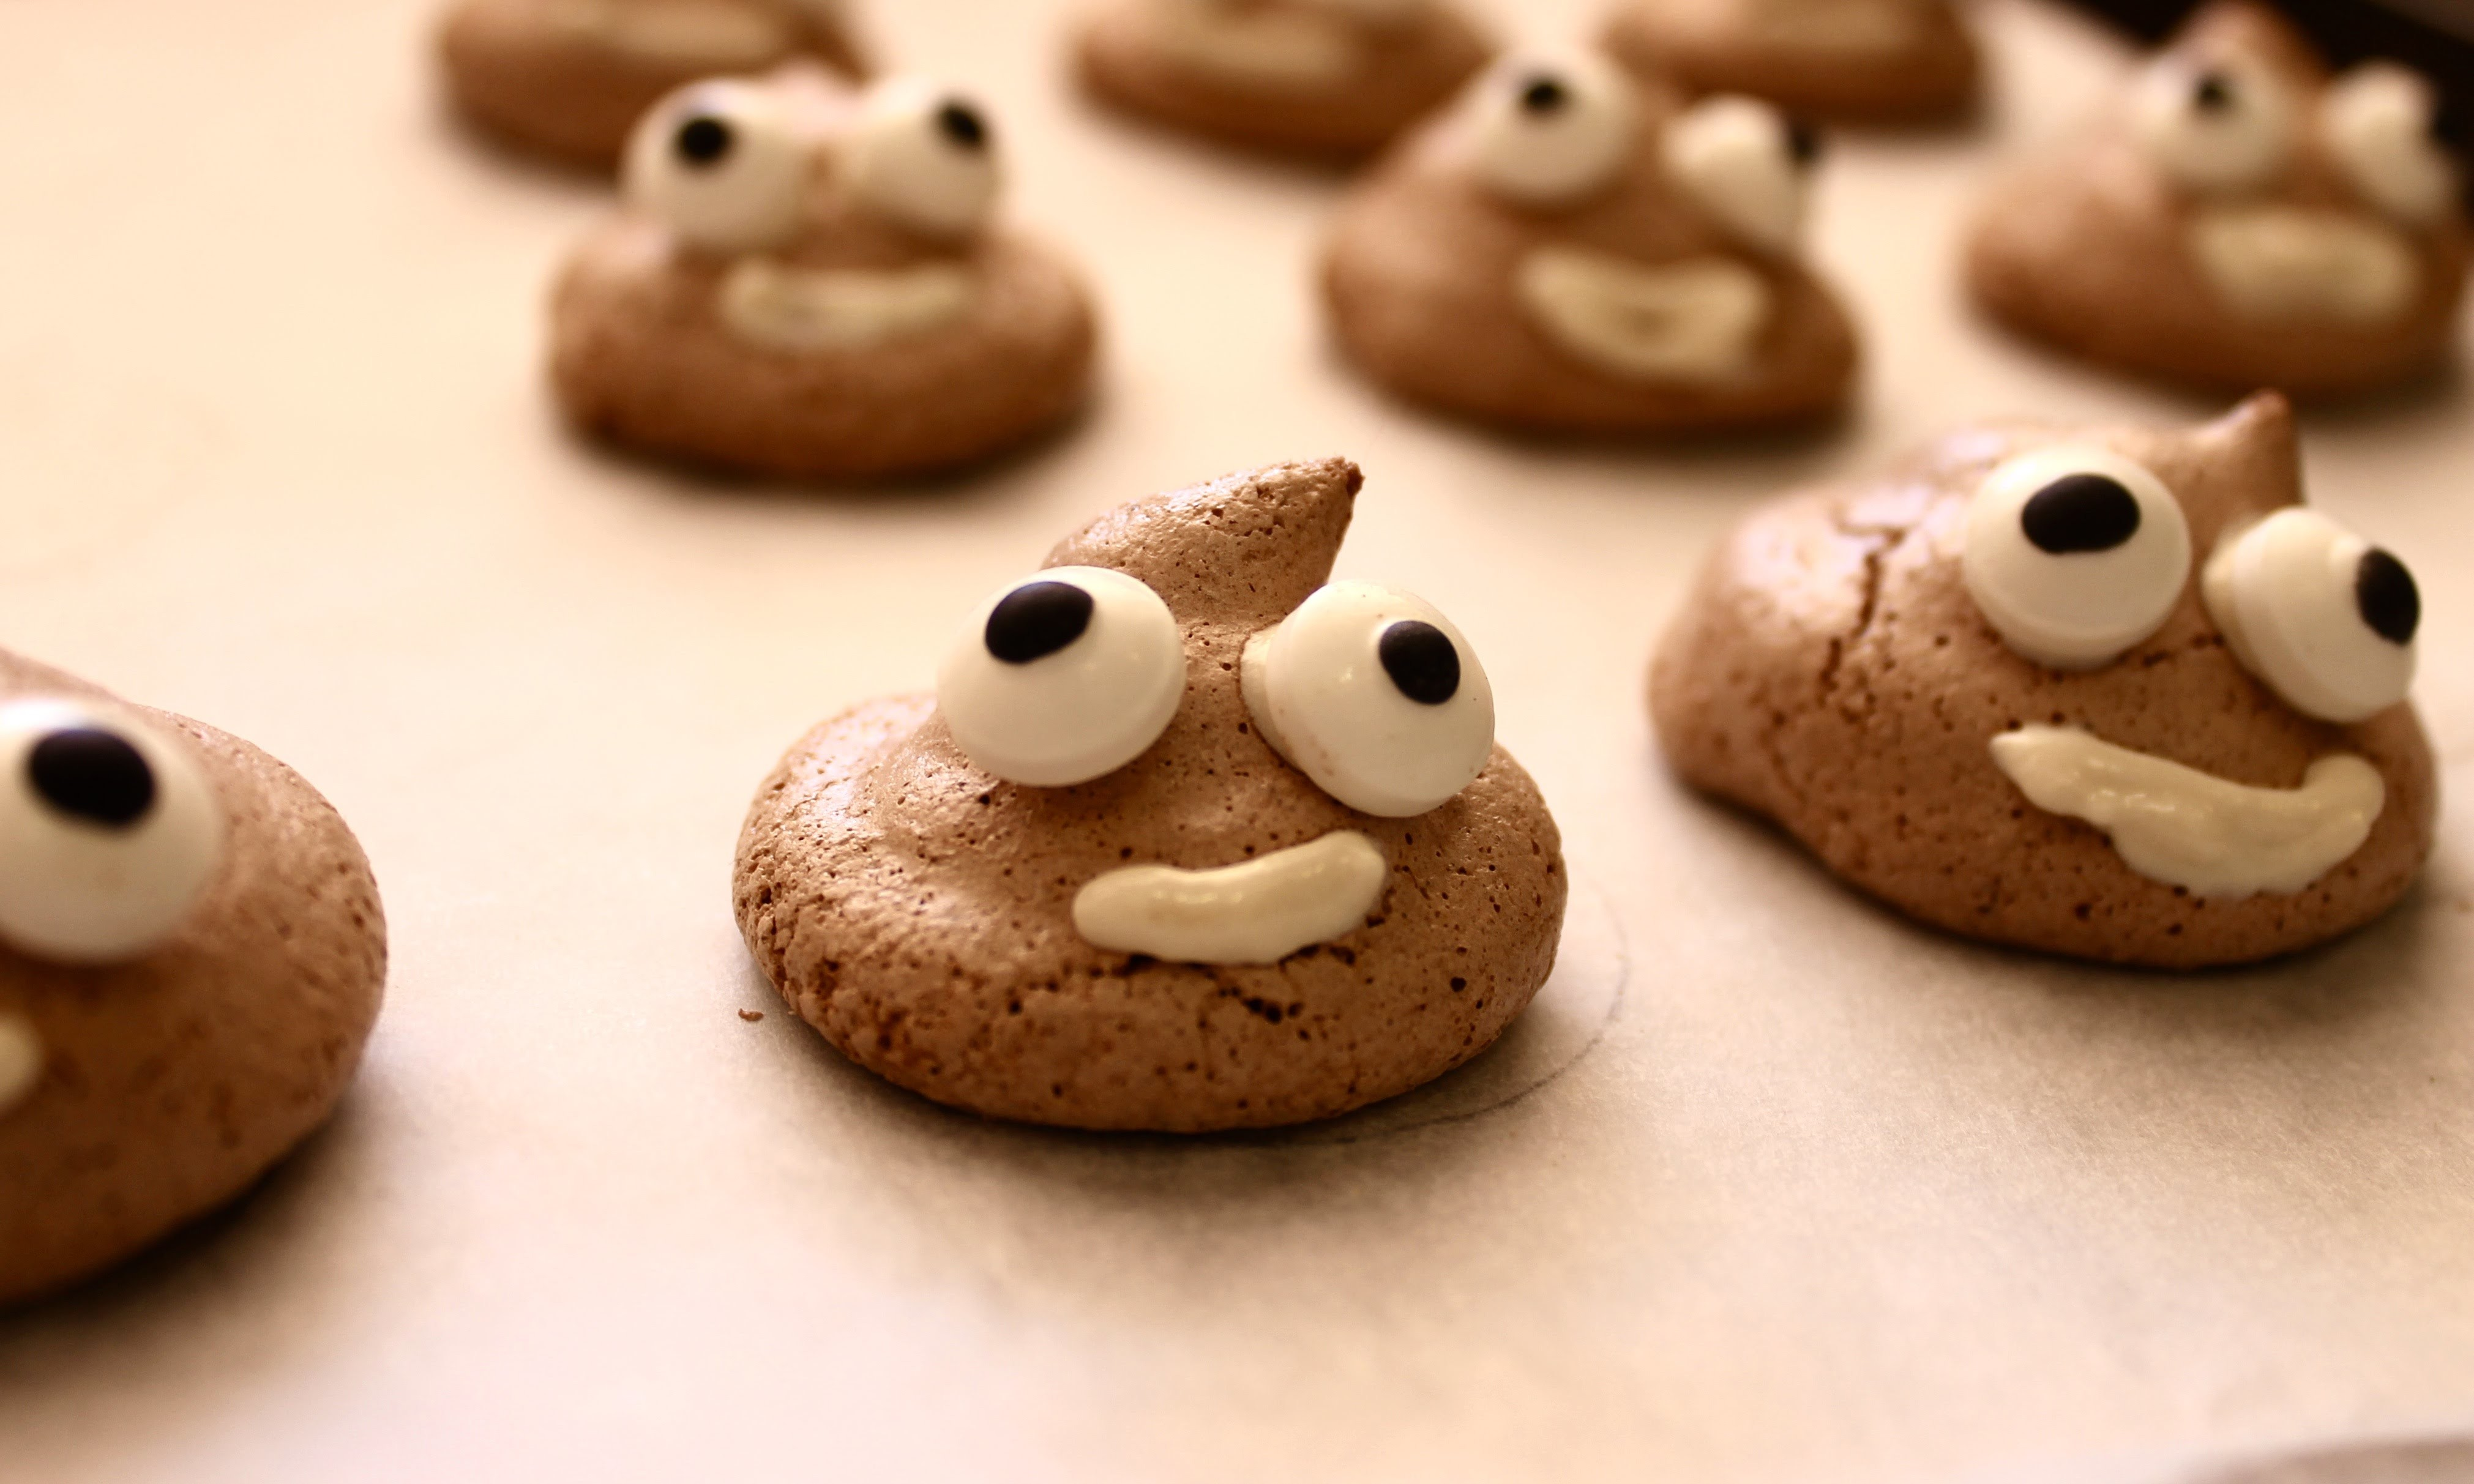 Easy party food recipe: How to make poo emoji meringues